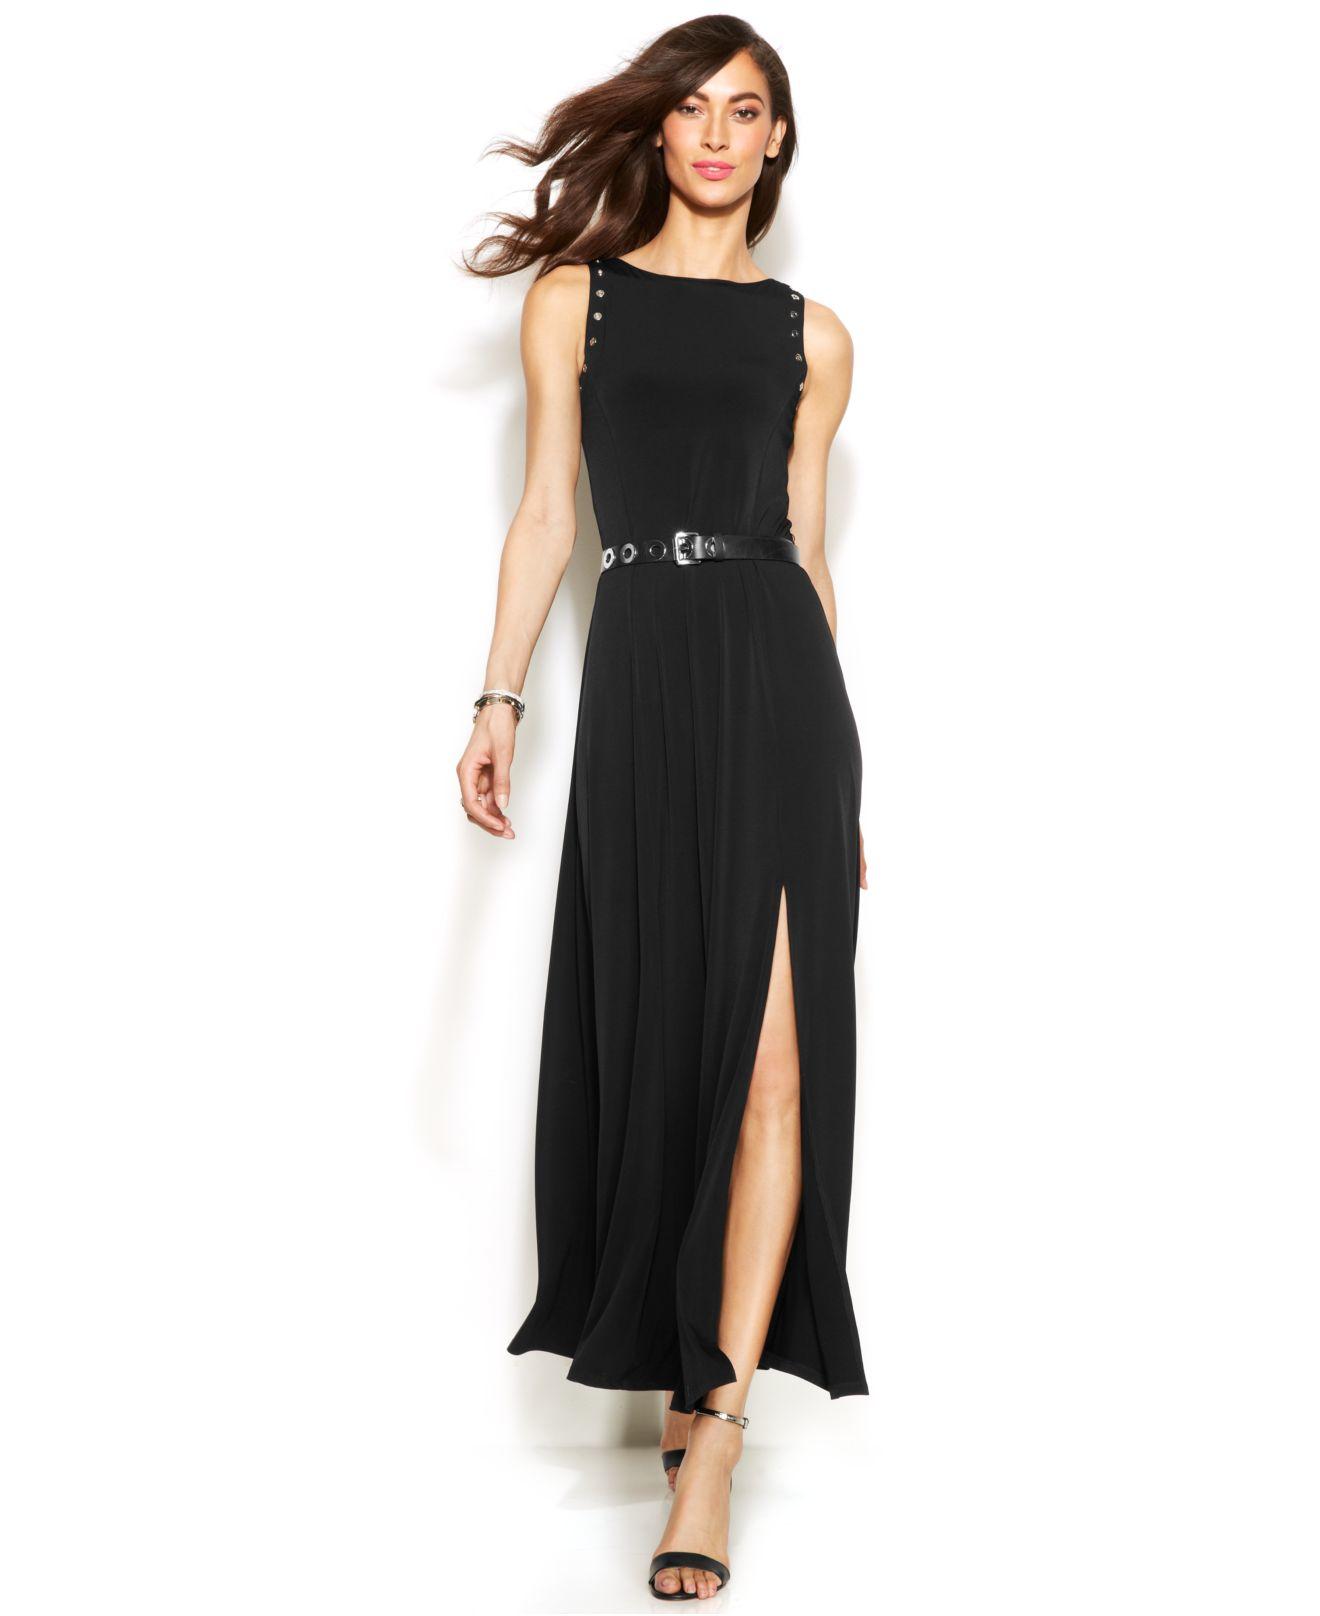 Lyst - Michael Kors Michael Grommet-Trim Belted Maxi Dress ...